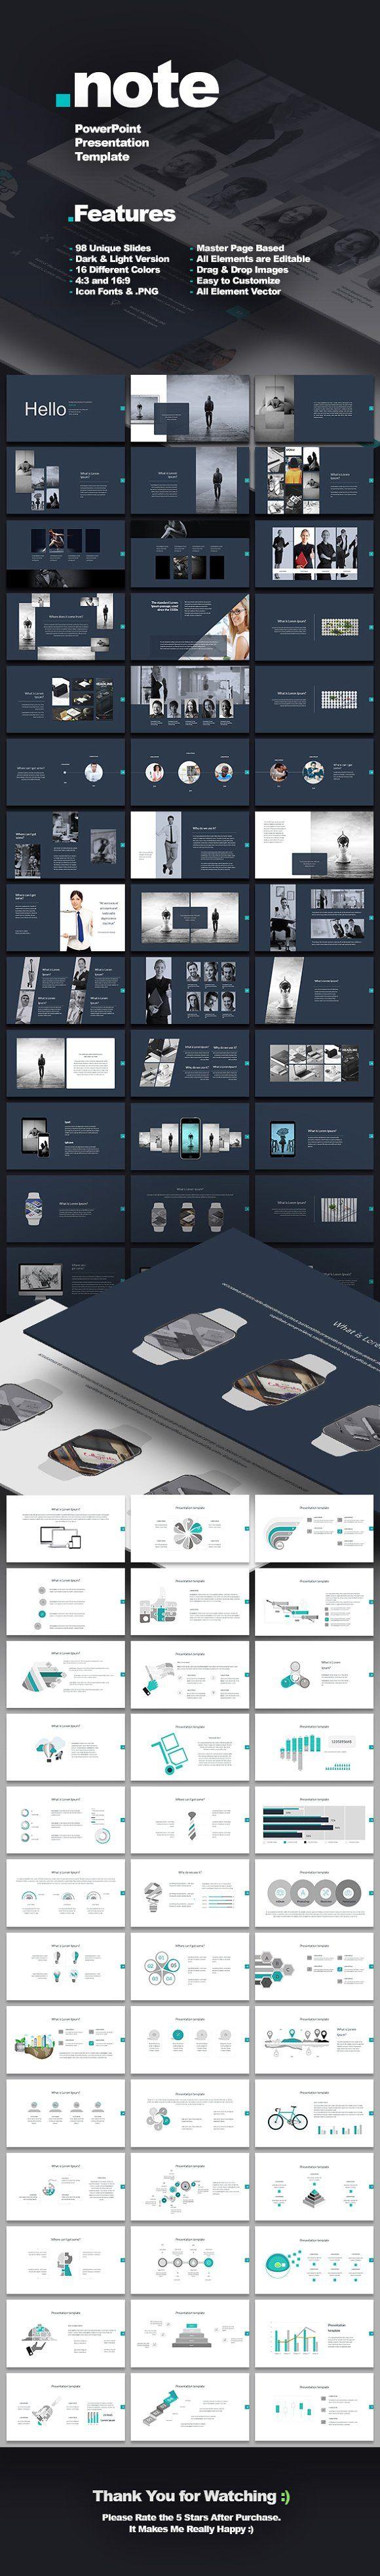 Bandle 3 presentation template  by oyunerdene99 on @creativemarket